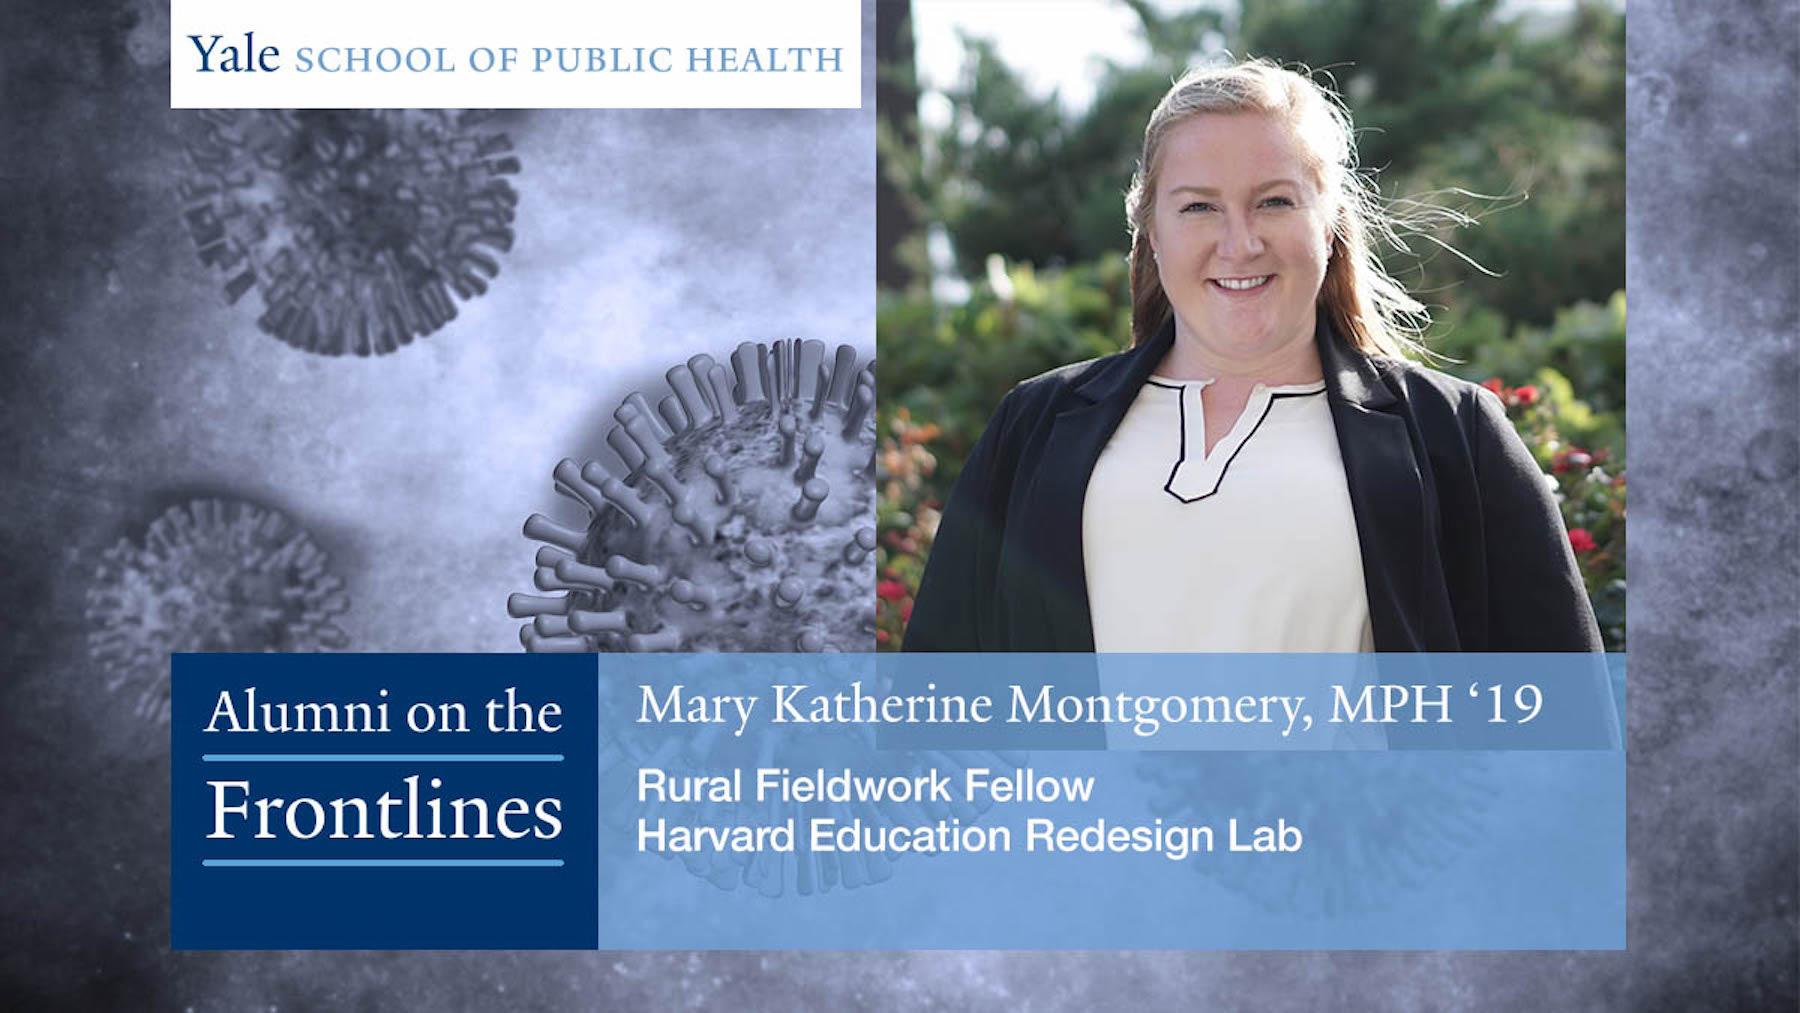 Mary Katherine 'MK' Montgomery, MPH '19